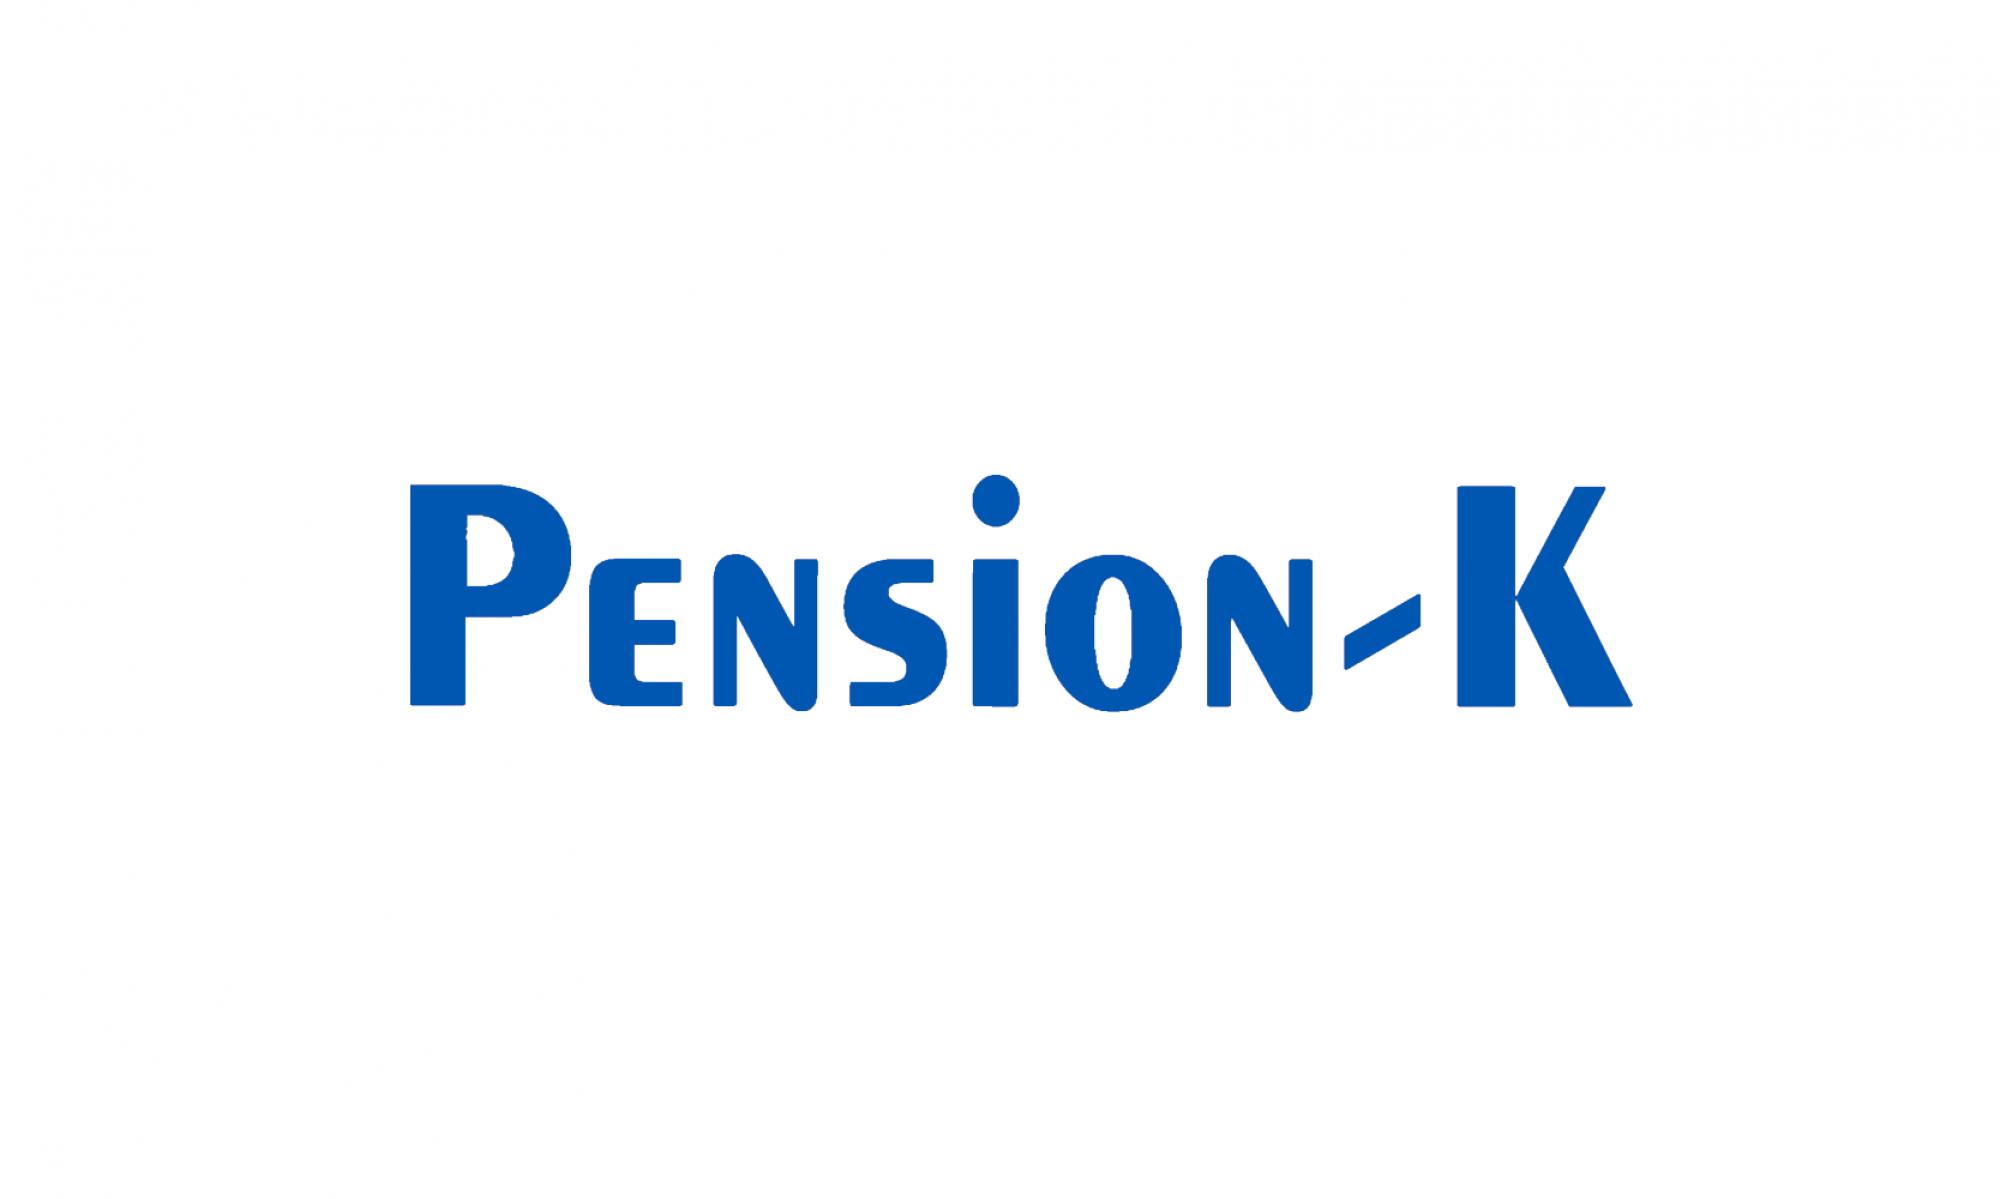 PENSION-K